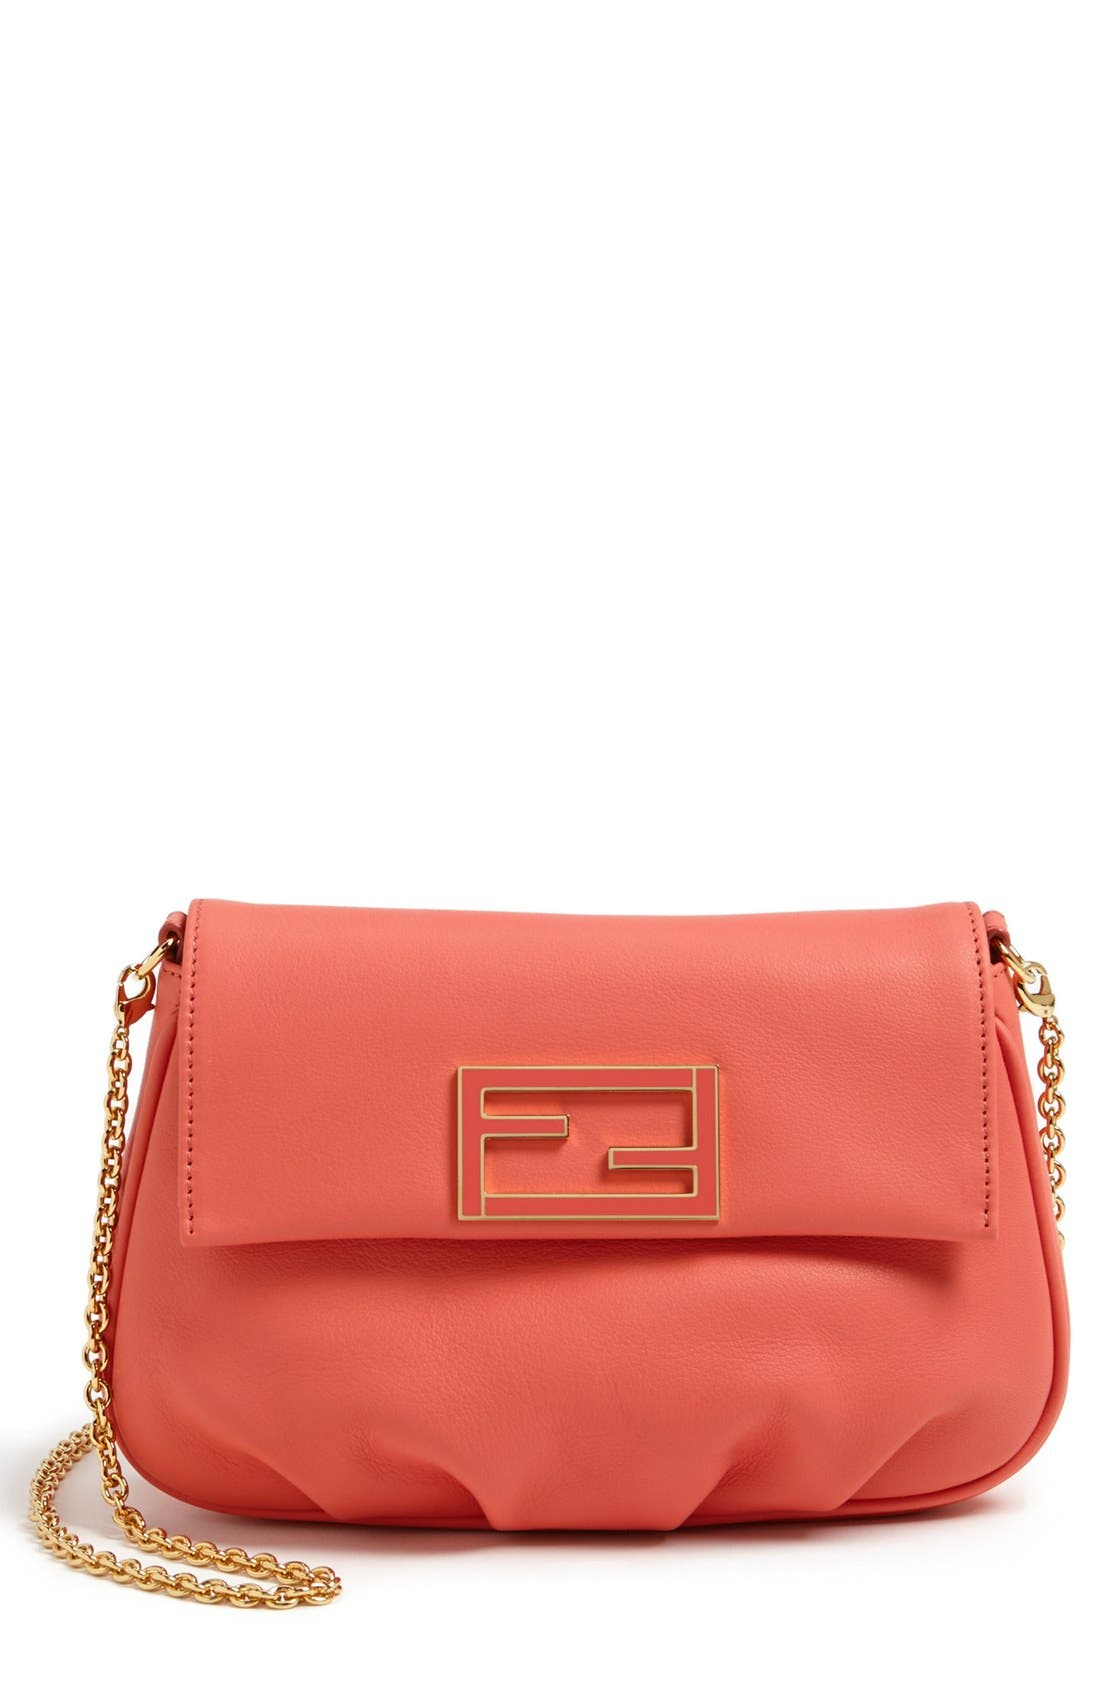 Main Image - Fendi 'Fendista' Pouchette Crossbody Bag